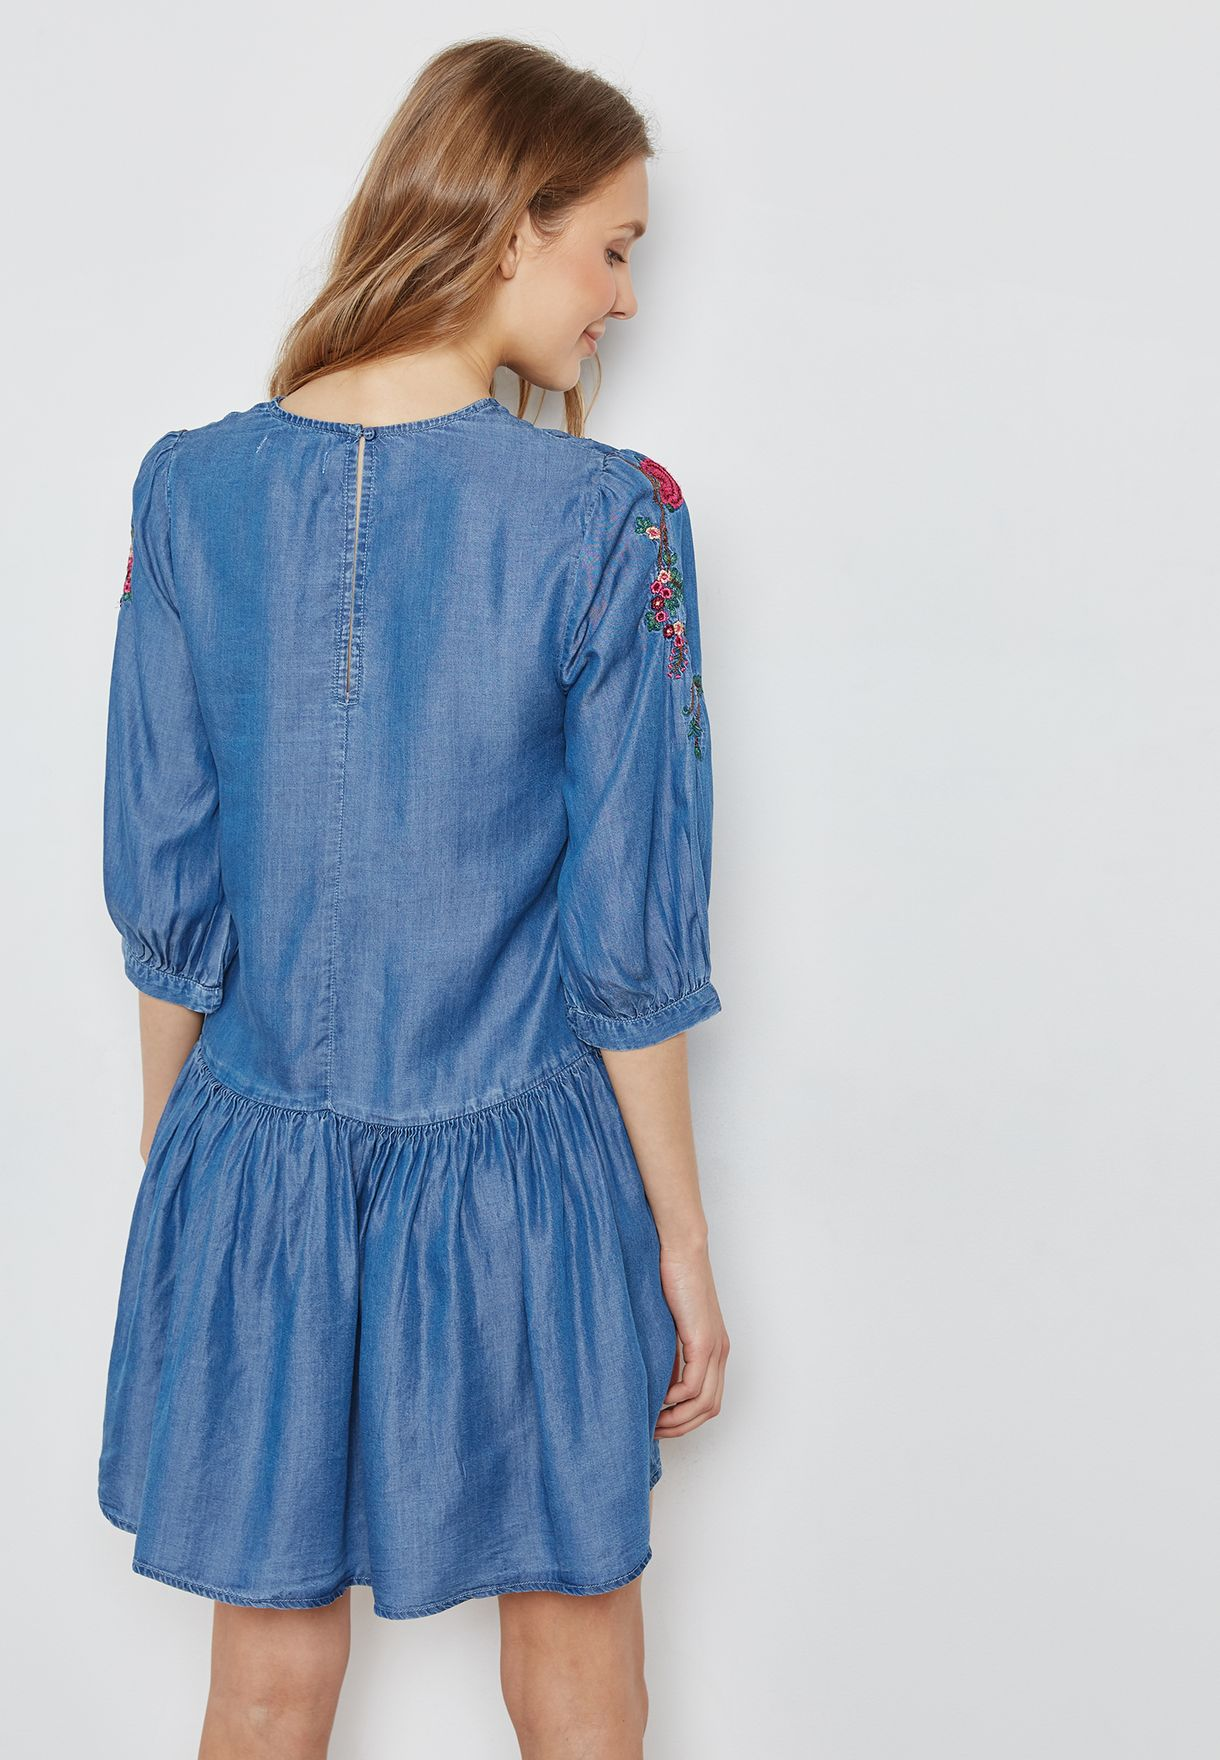 Pleated Embroidered Denim Dress